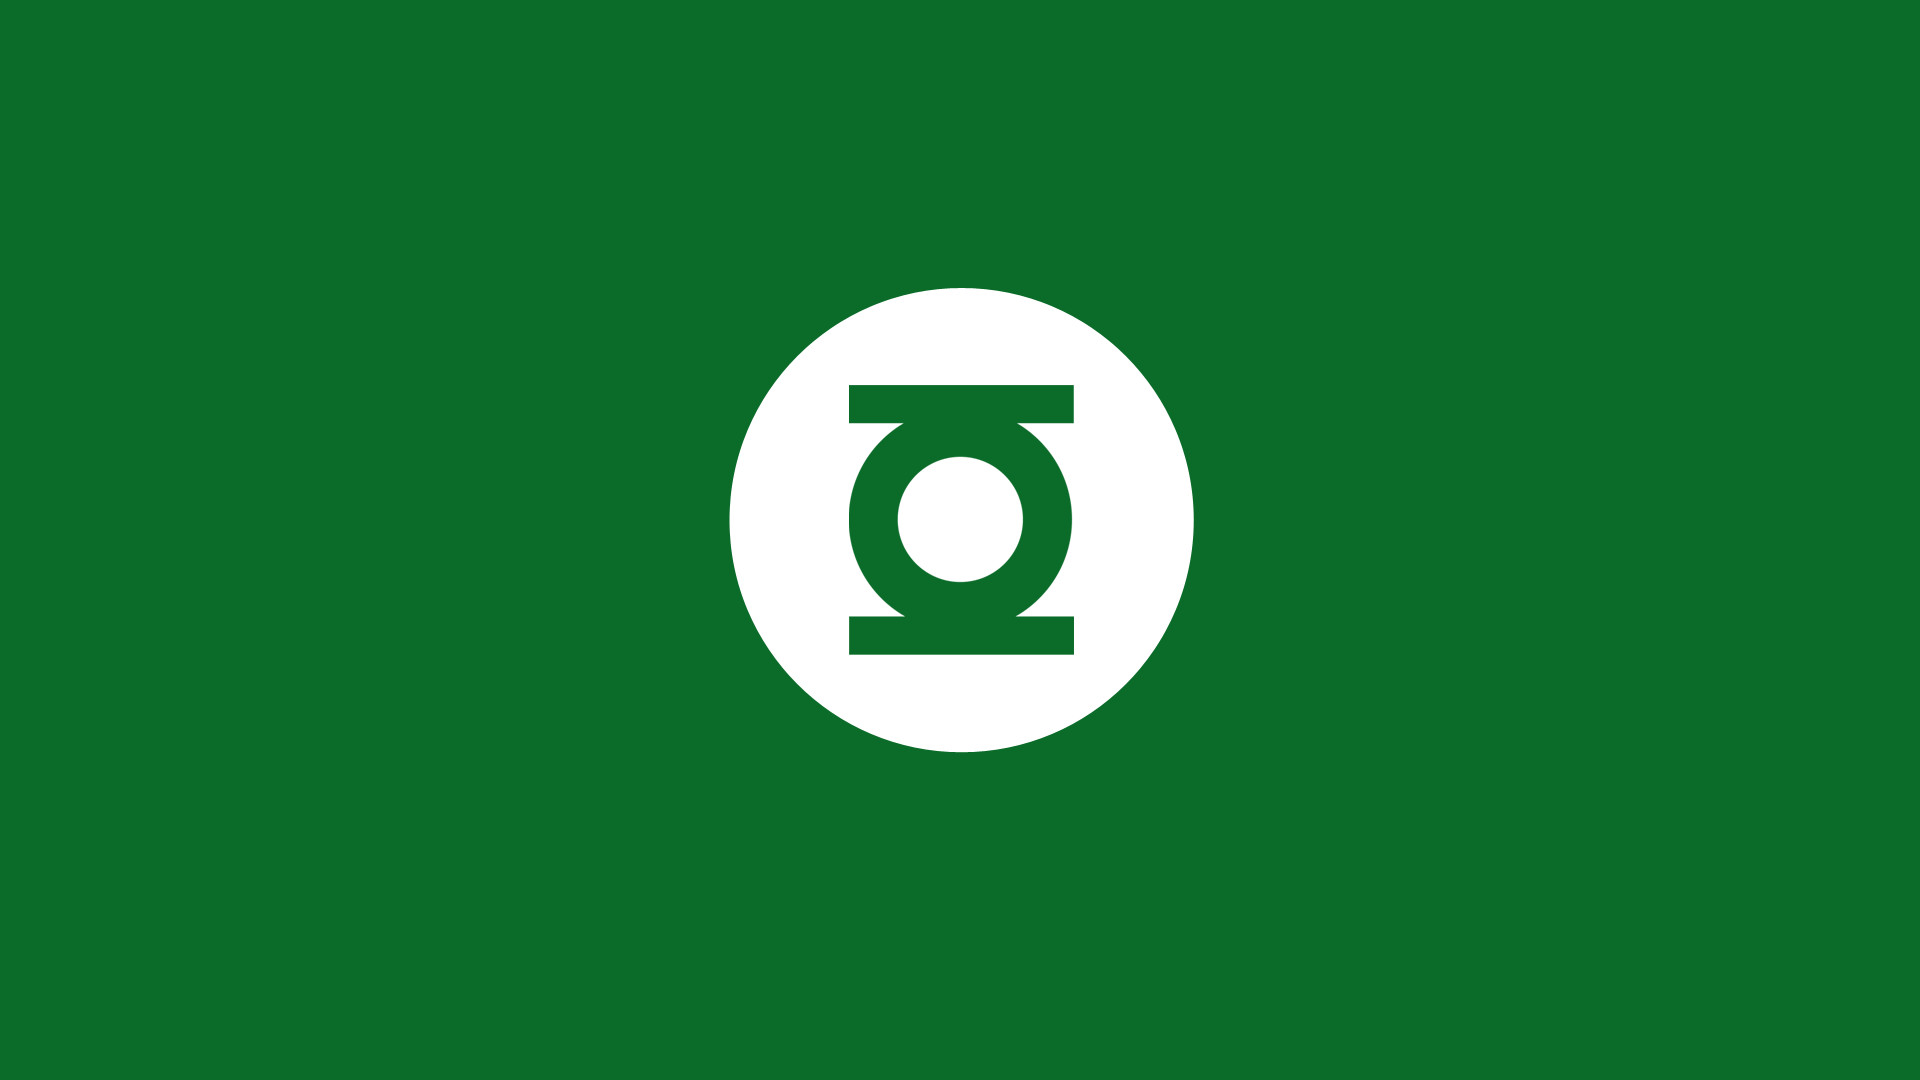 Green Lantern Logo Wallpapers – Wallpaper Cave